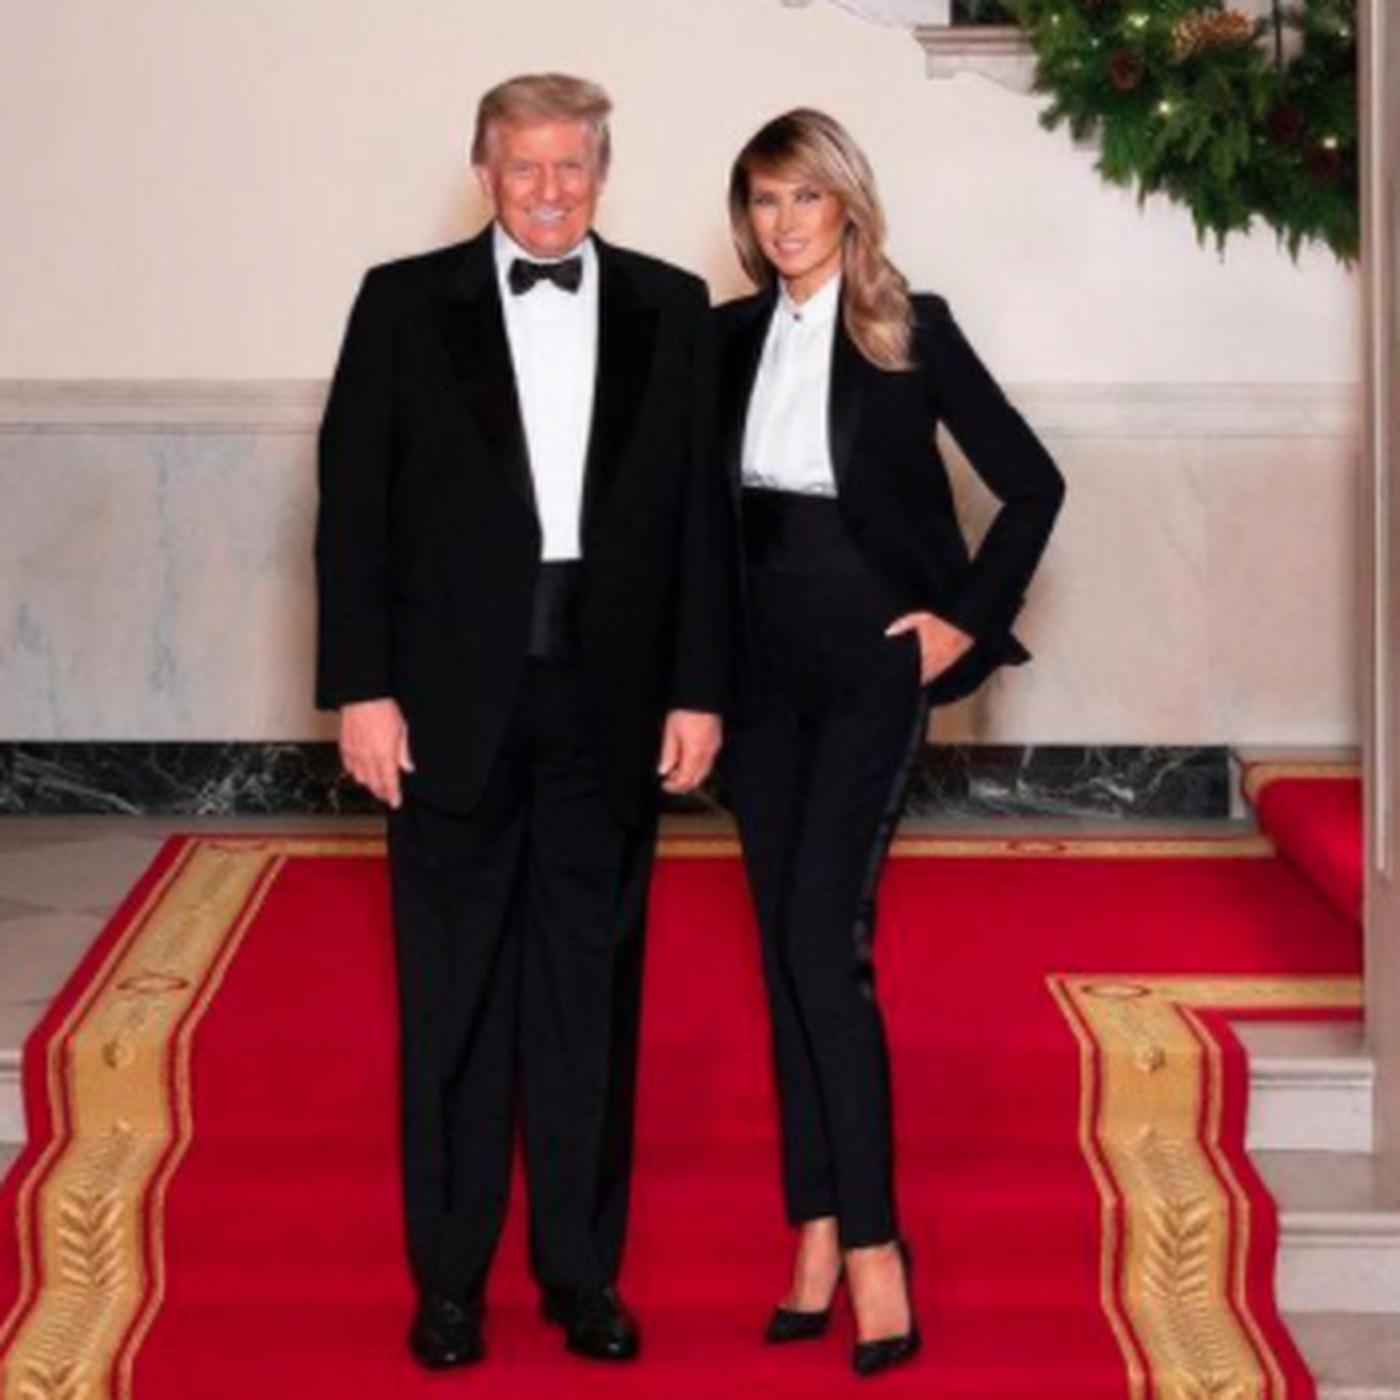 President Trump Melania Trump Sport Matching Tuxedos In 2020 Christmas Portrait Chicago Sun Times